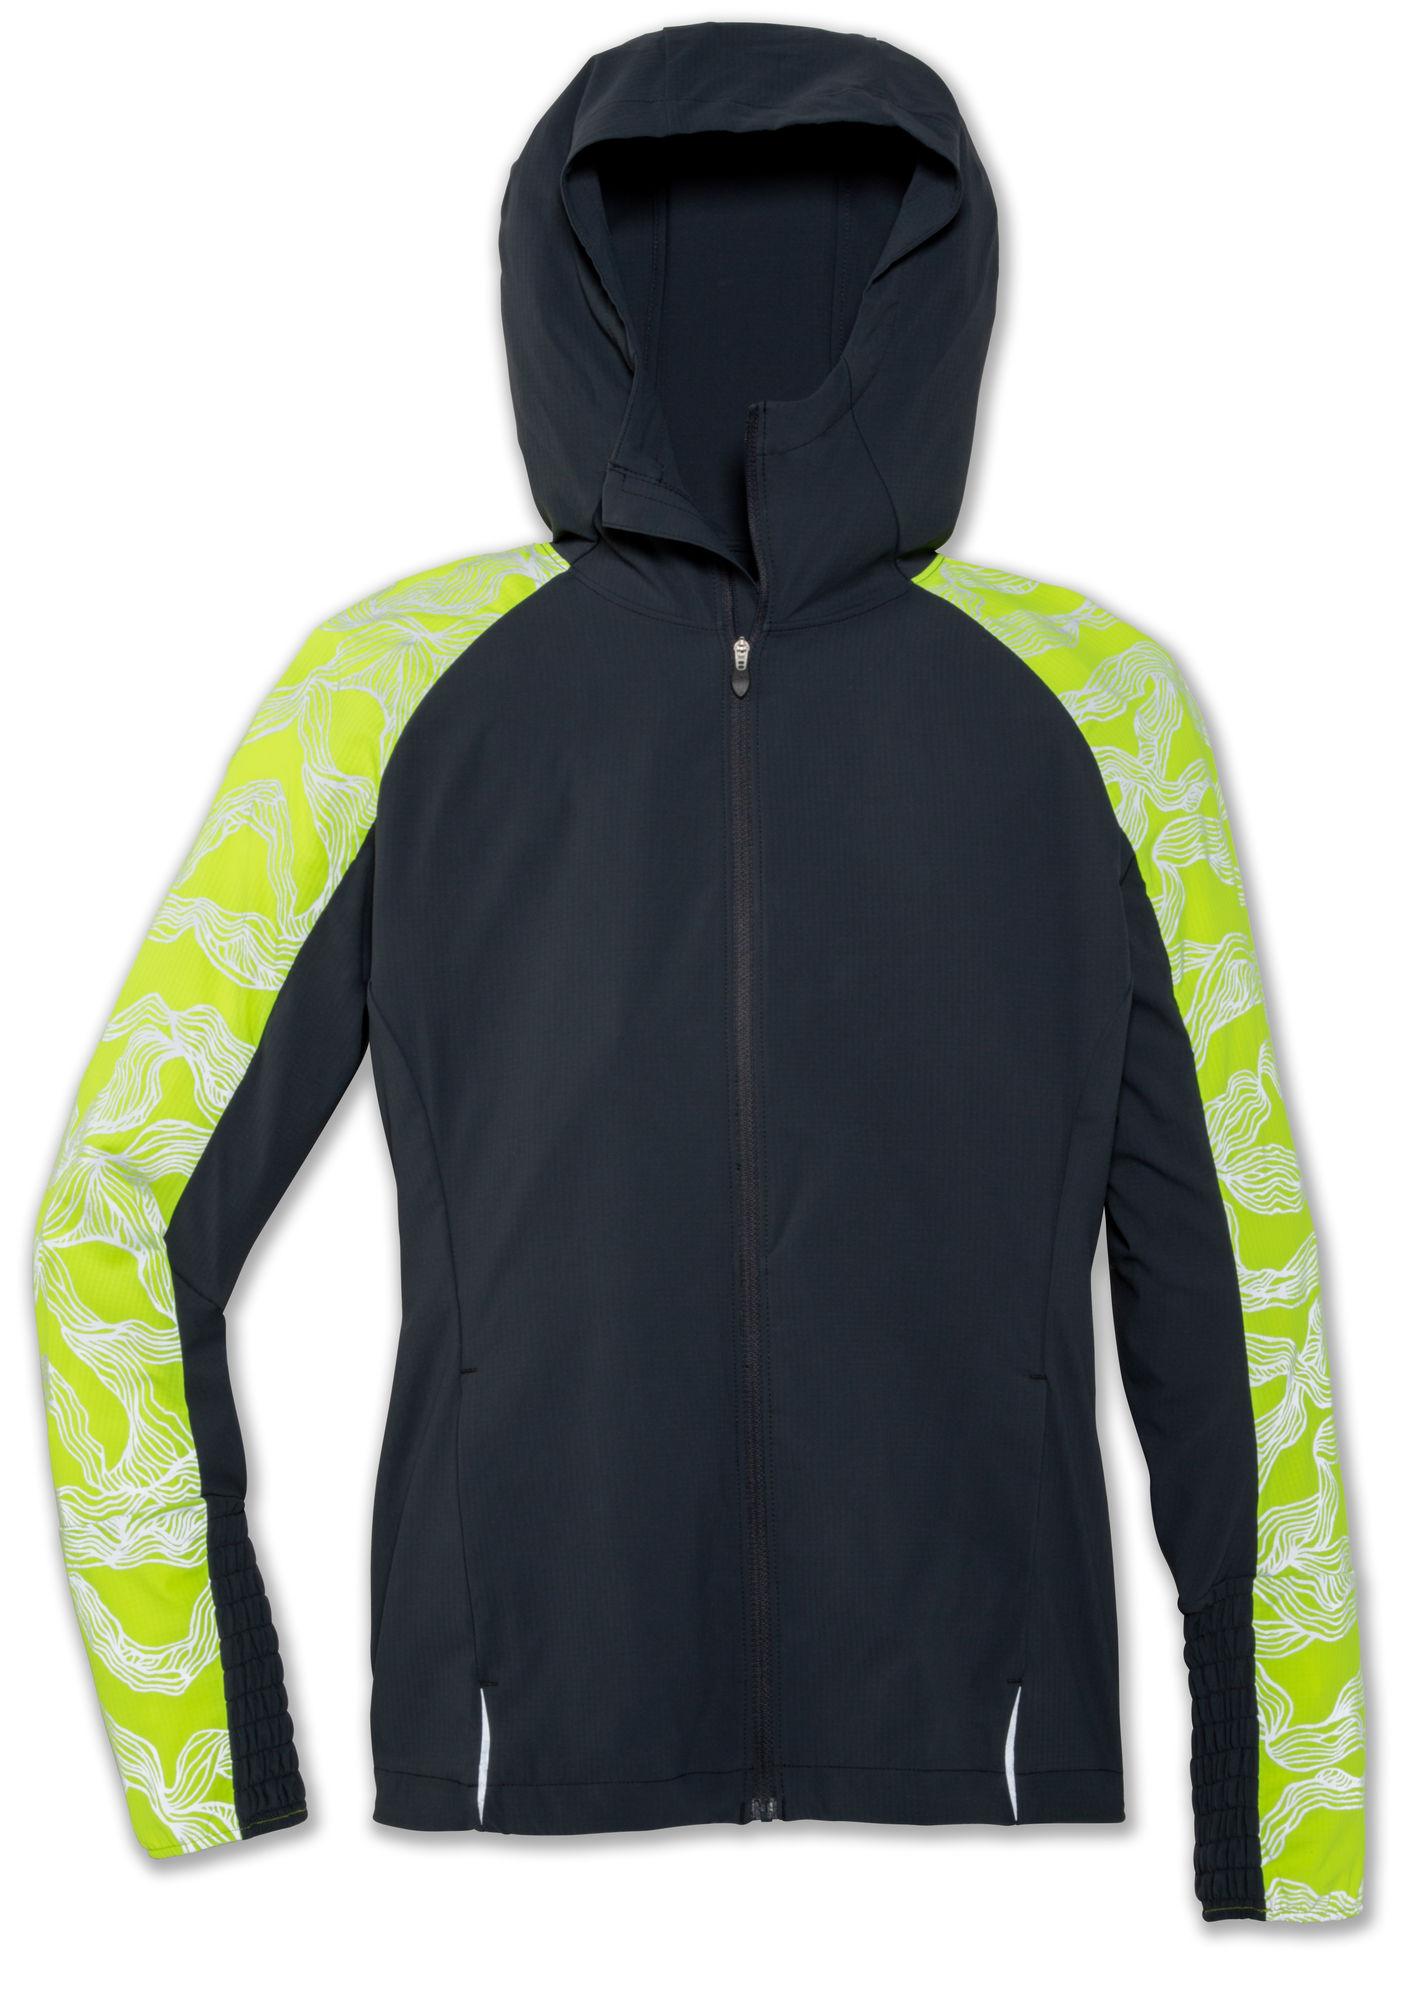 Brooks Lady Nightlife Jacket (Grau Gelb)